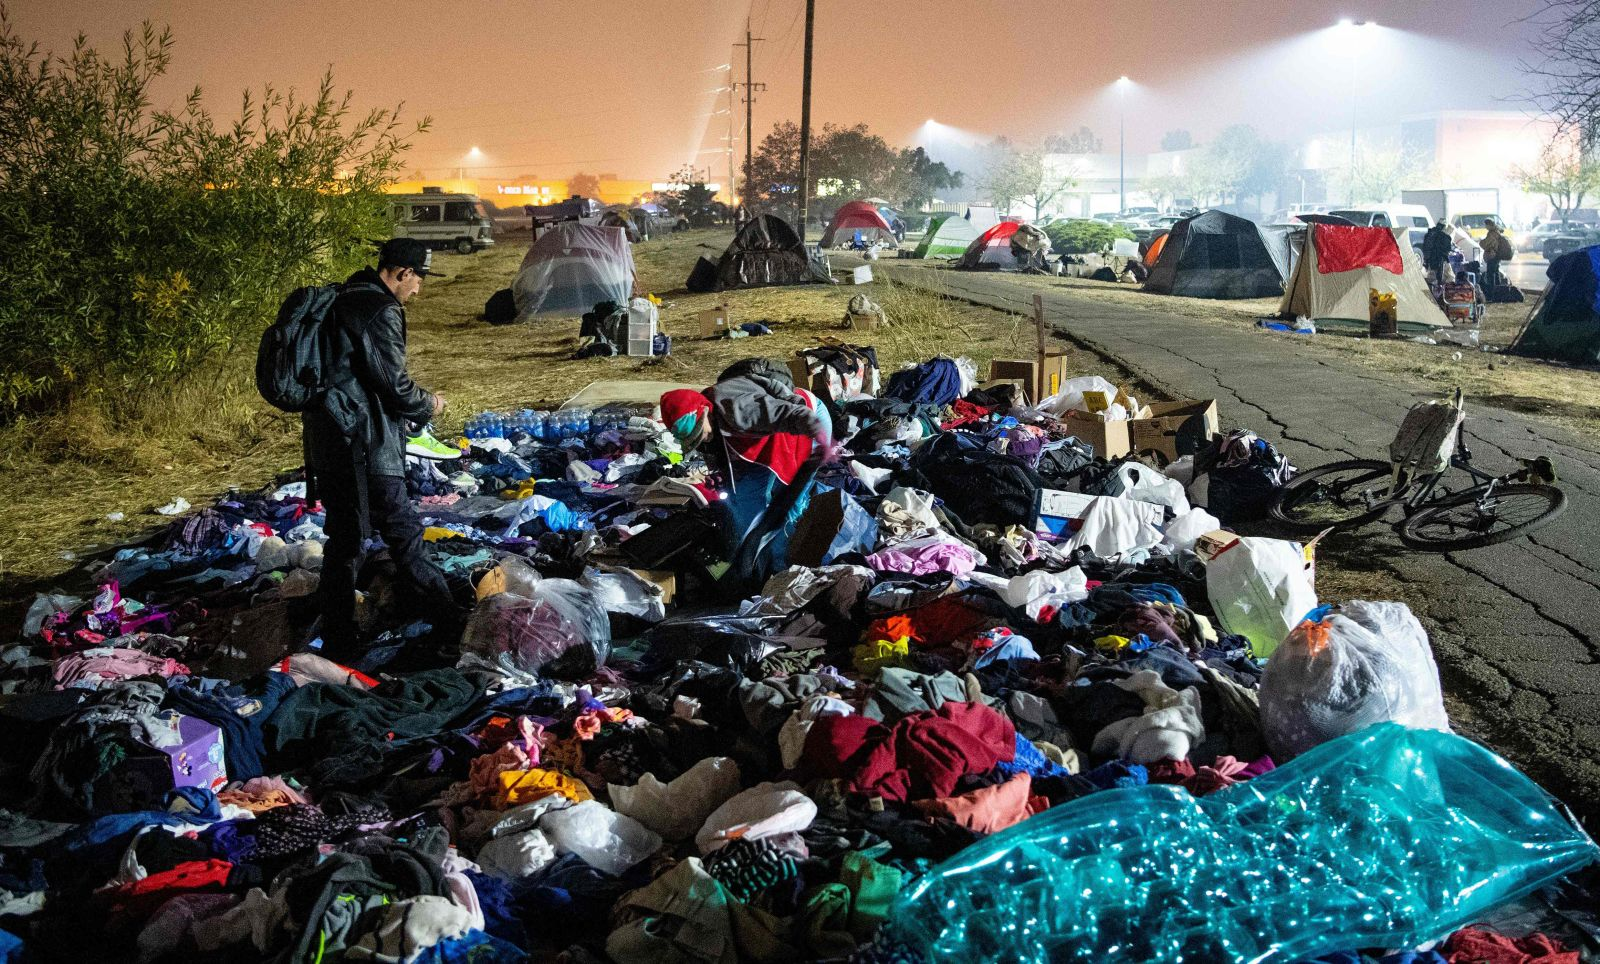 Wildfire evacuees take refuge in Walmart parking lot